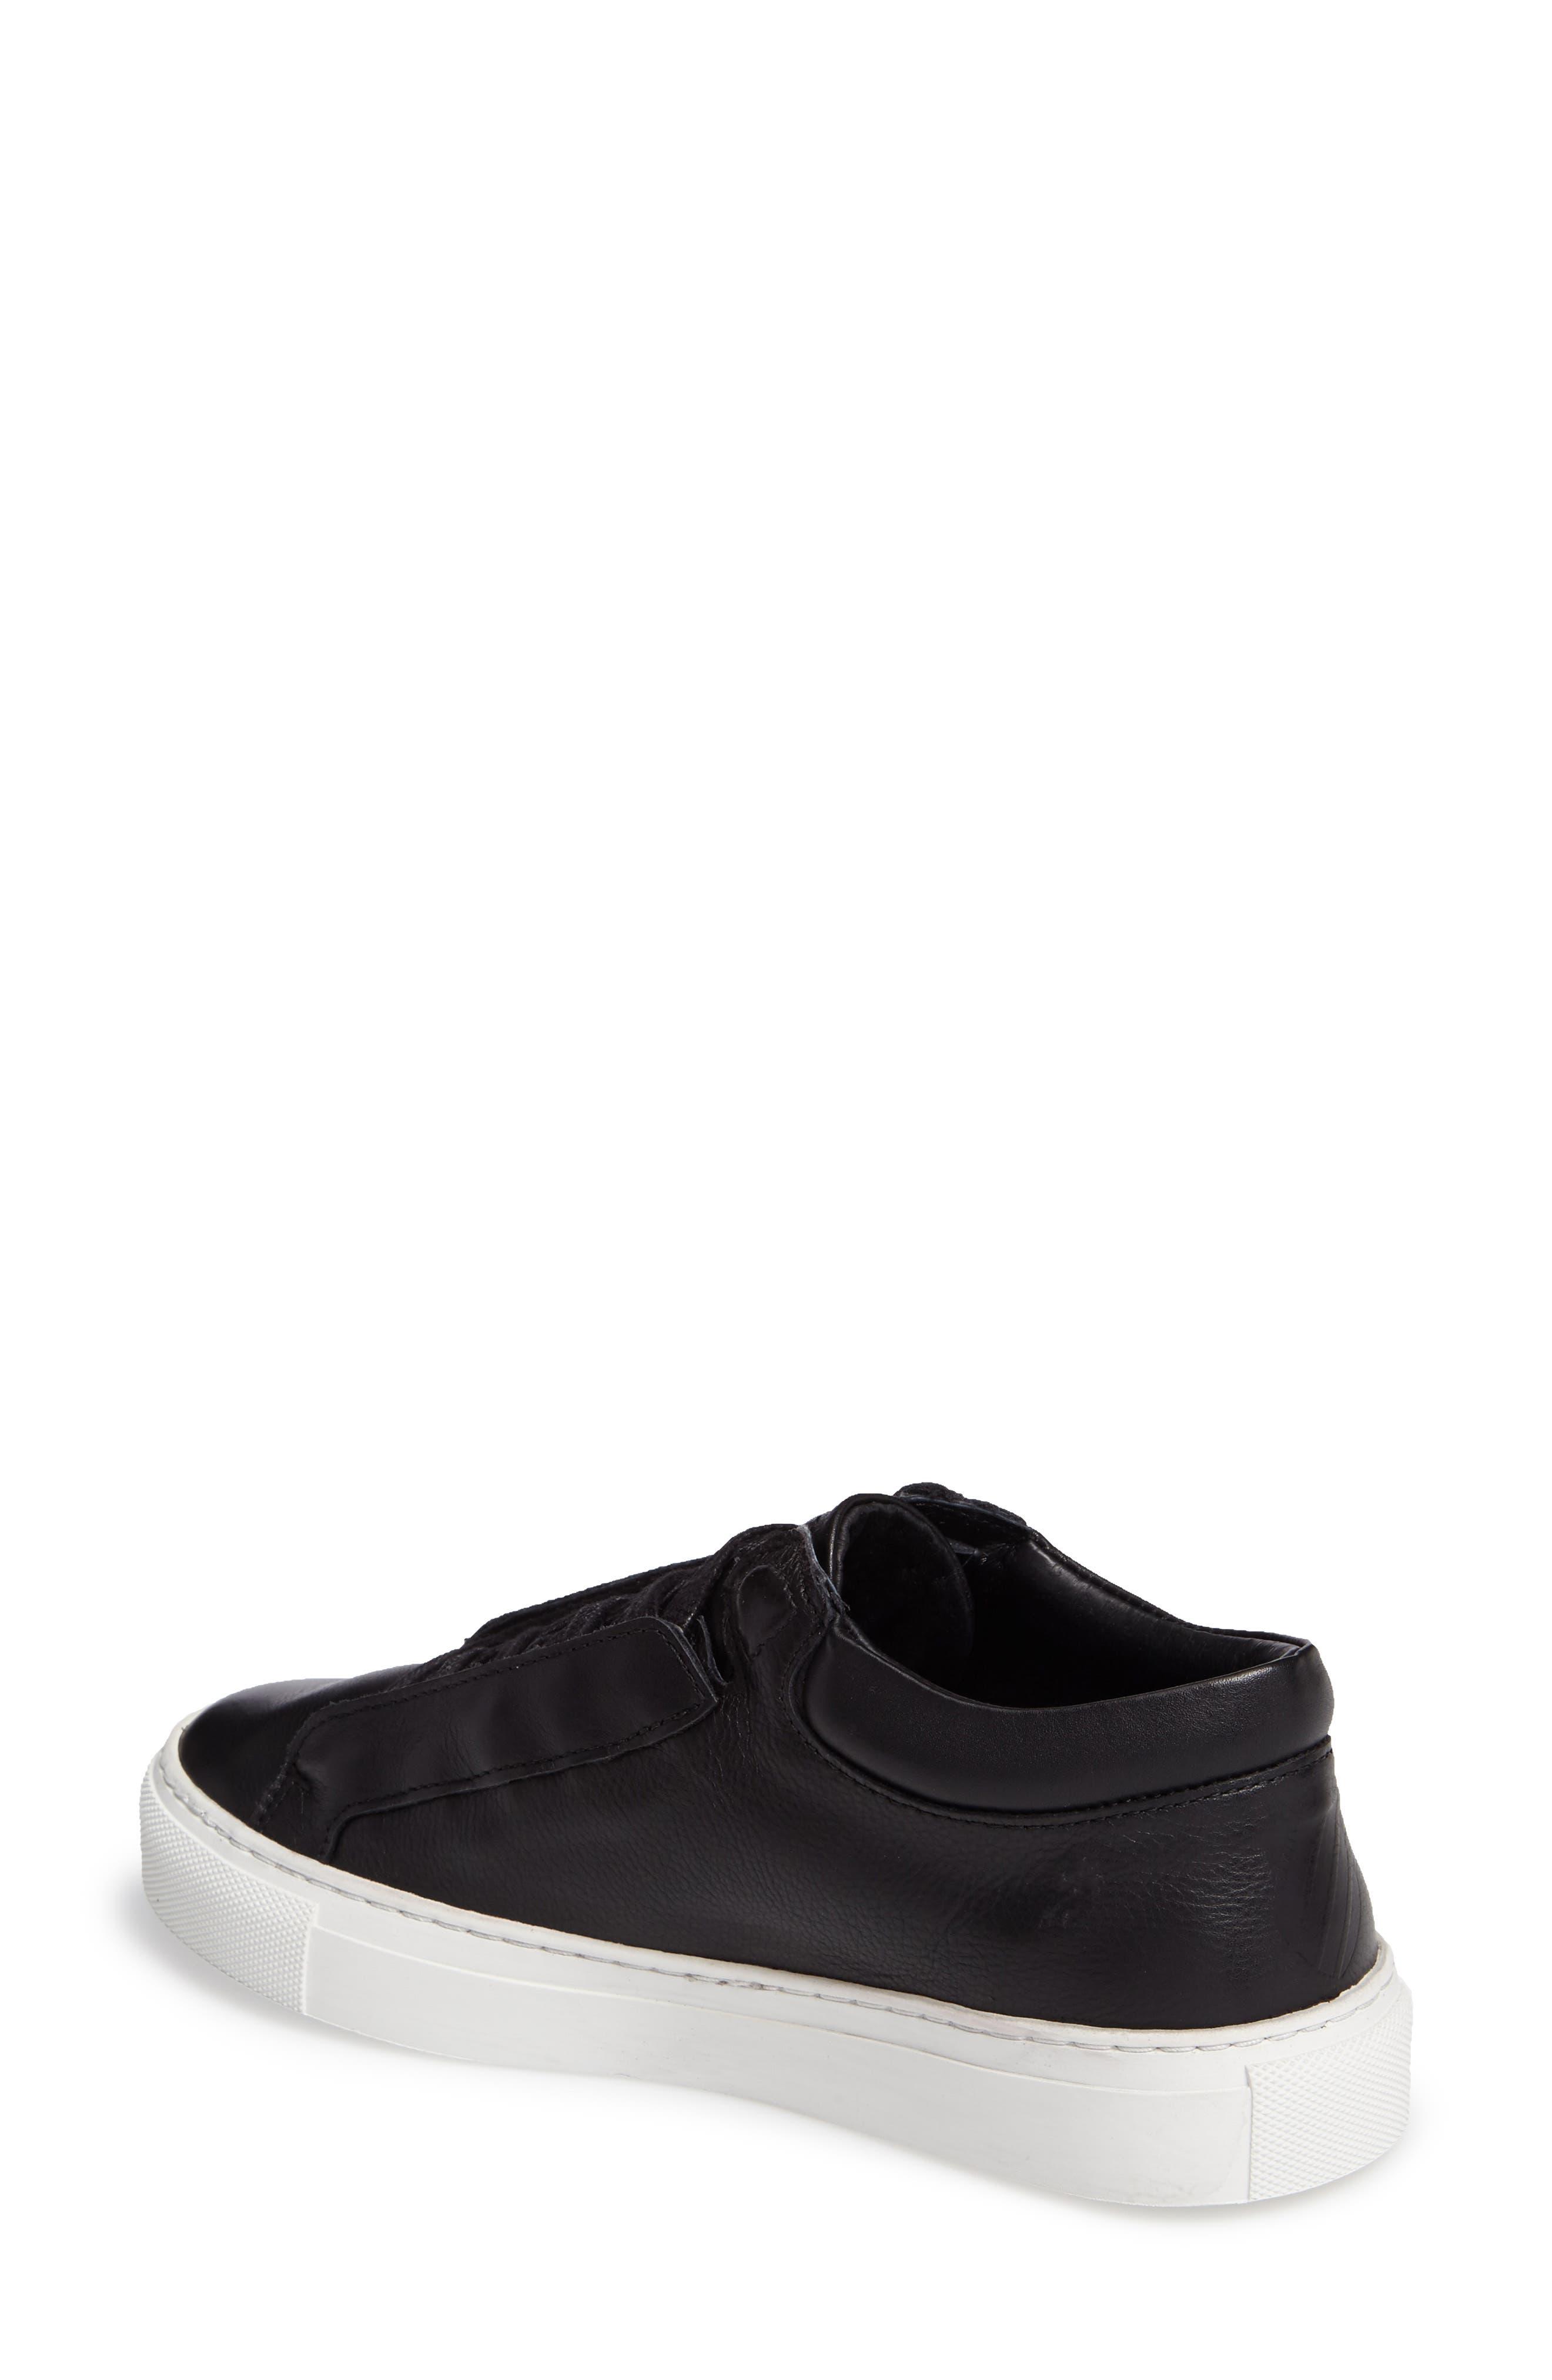 Novo Demi Sneaker,                             Alternate thumbnail 2, color,                             001